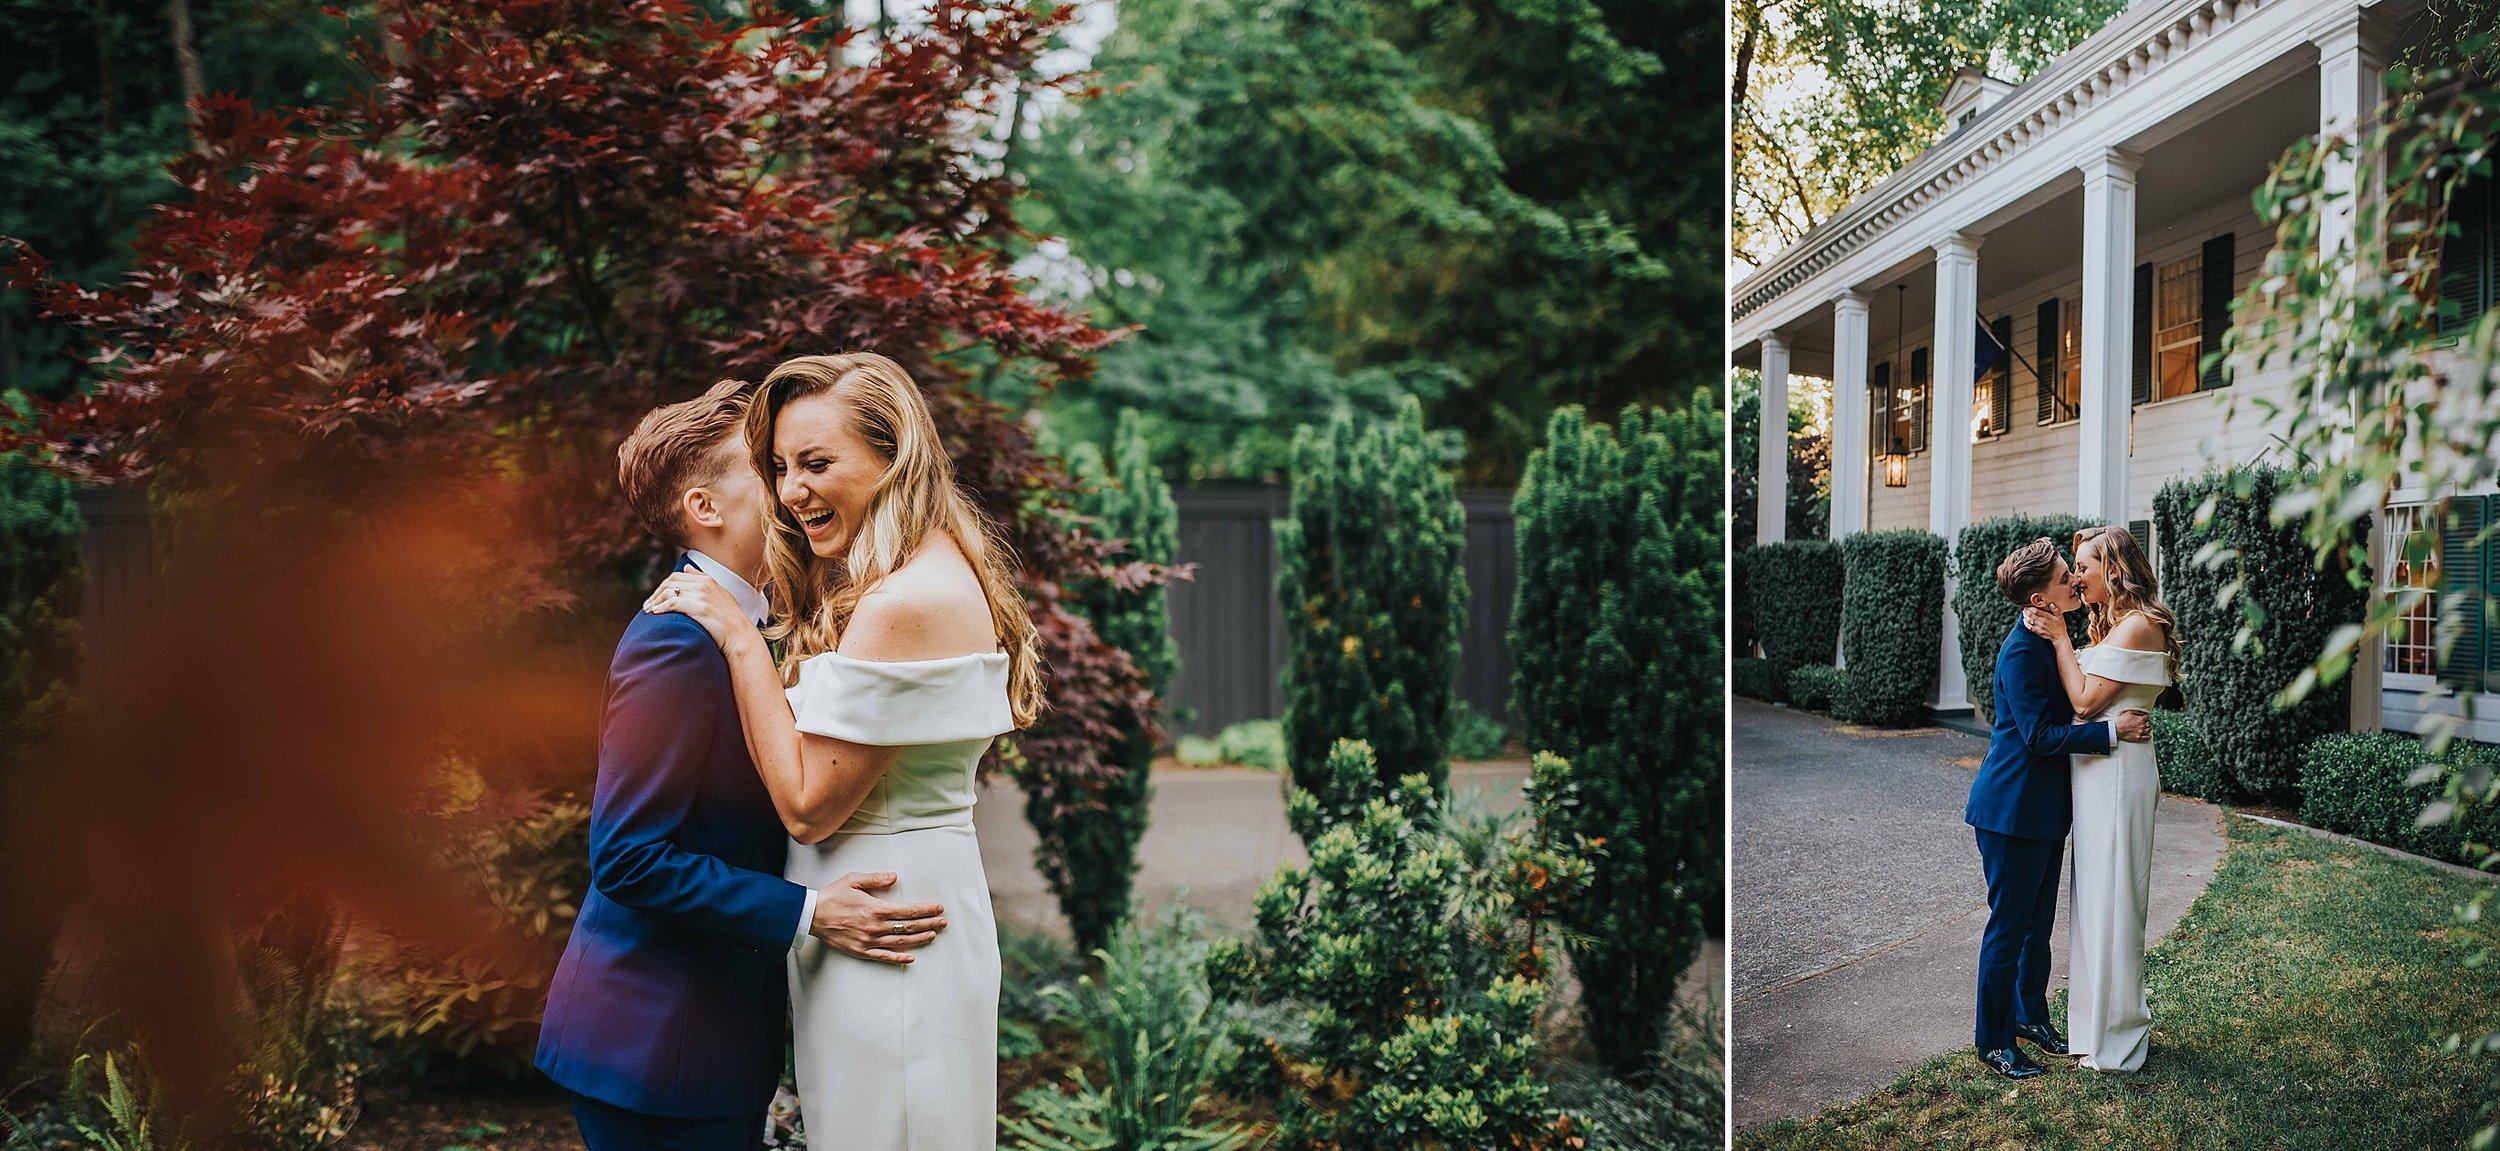 Seattle-Wedding-photographer-J HODGES PHOTOGRAPHY_0336.jpg